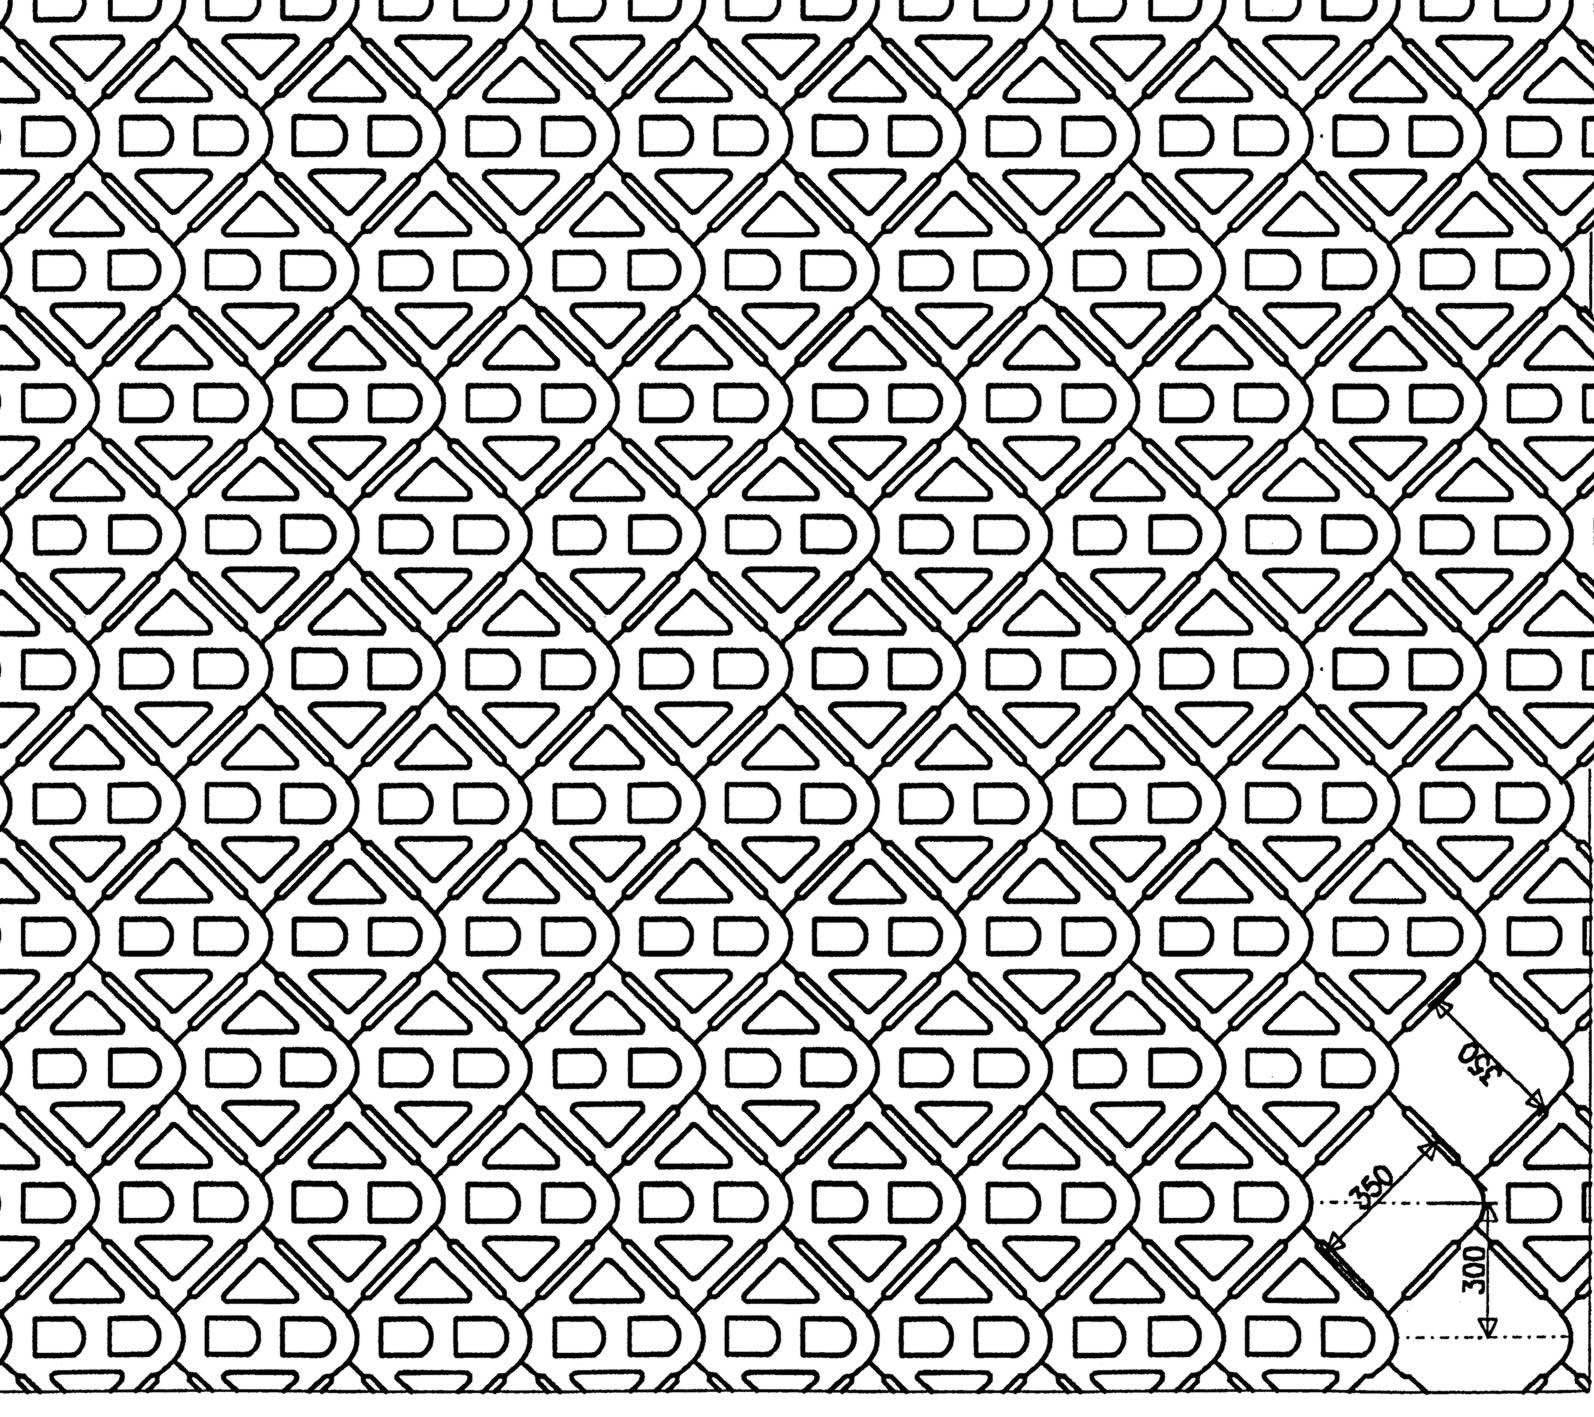 Terracrete hardlawn paver pattern